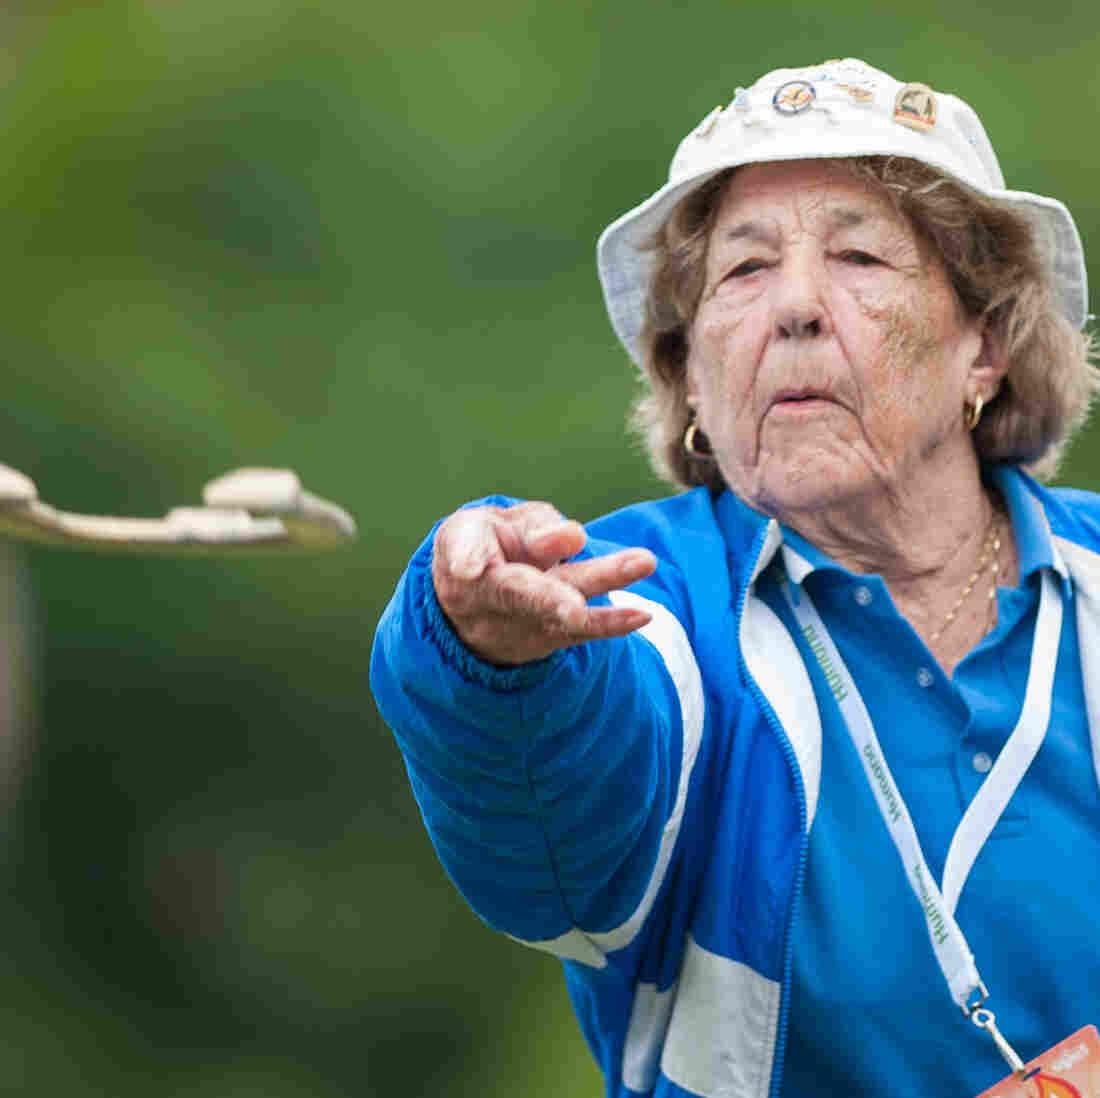 Pickleball, Anyone? Senior Athletes Play New Games And Old